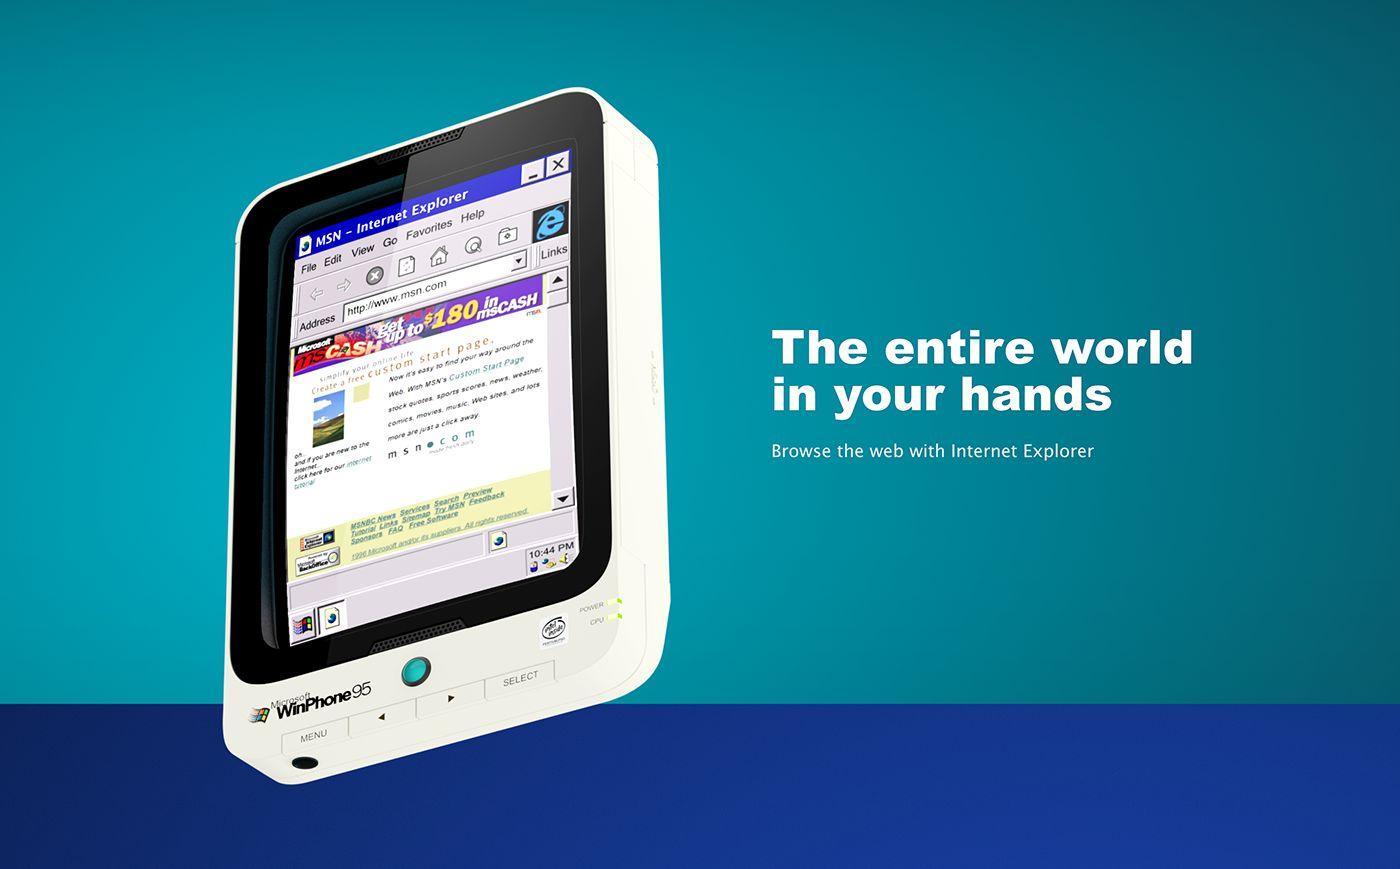 WinPhone 95 Windows 95 Smartphone